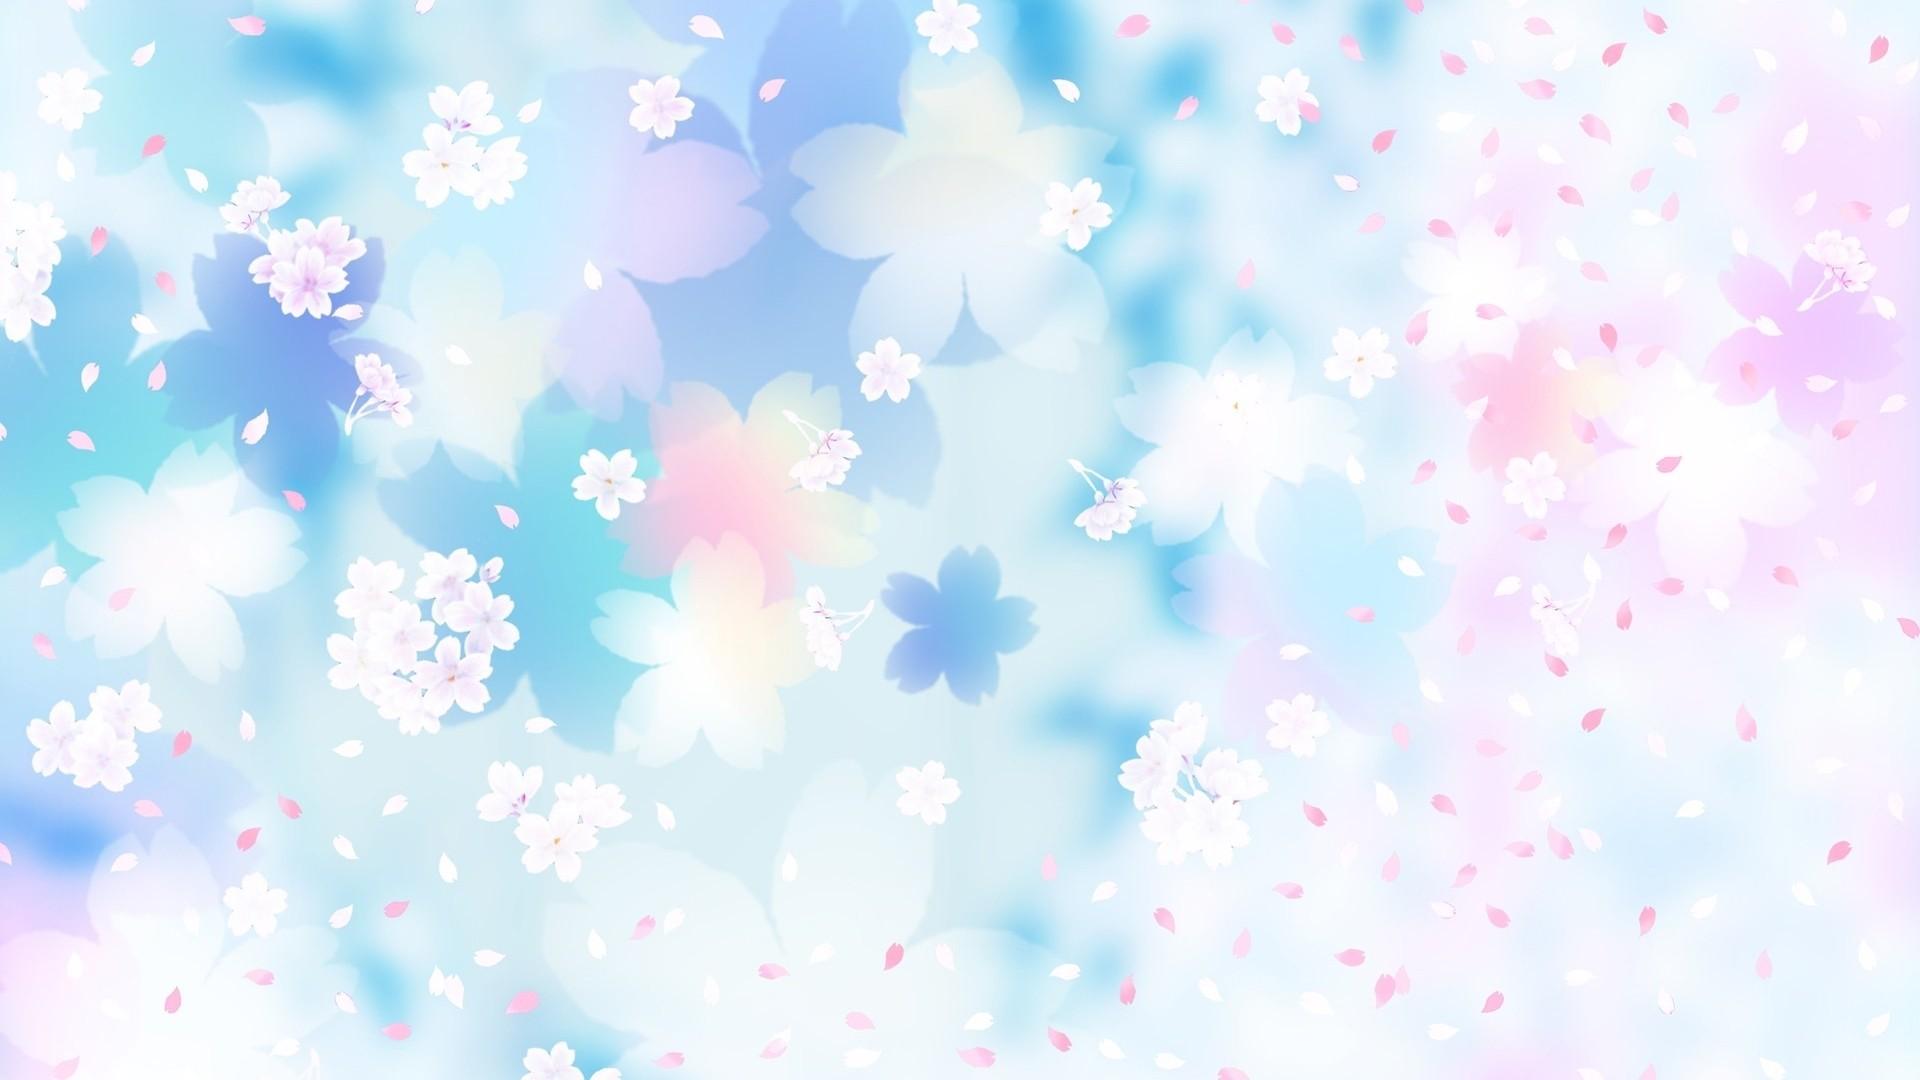 Pastel Color Free Wallpaper